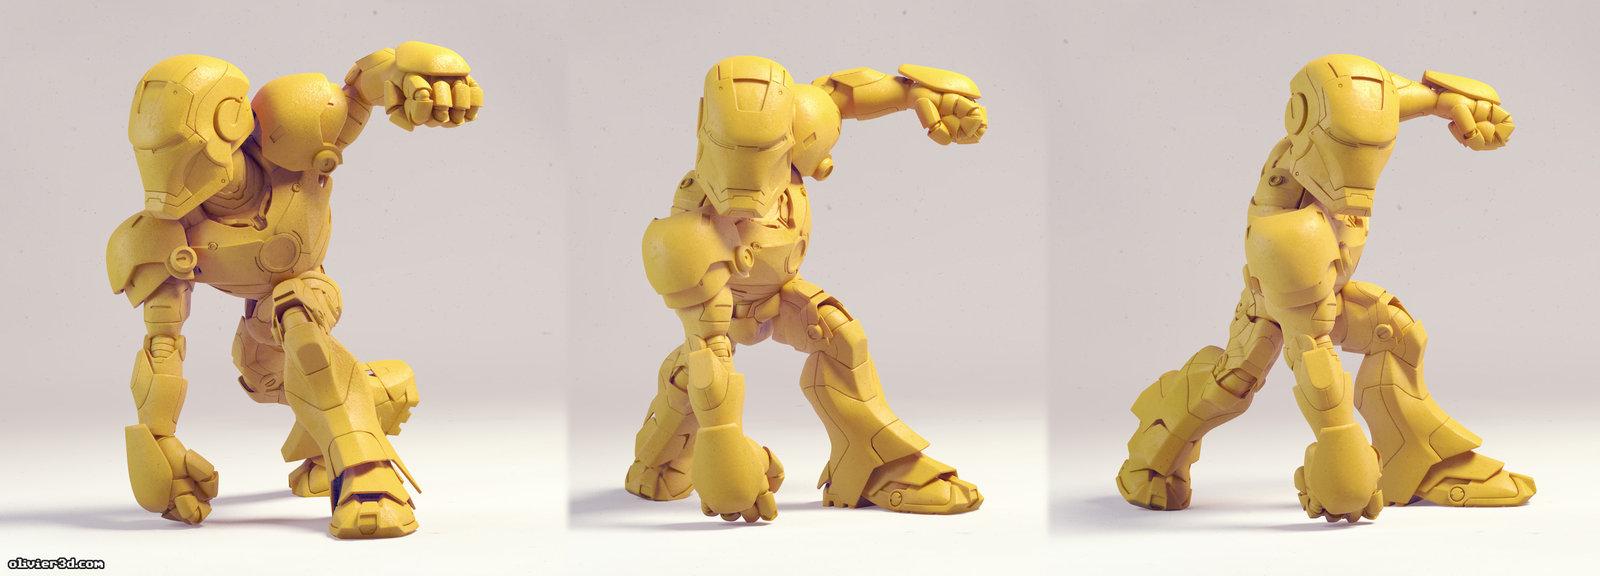 Ironman MK-III